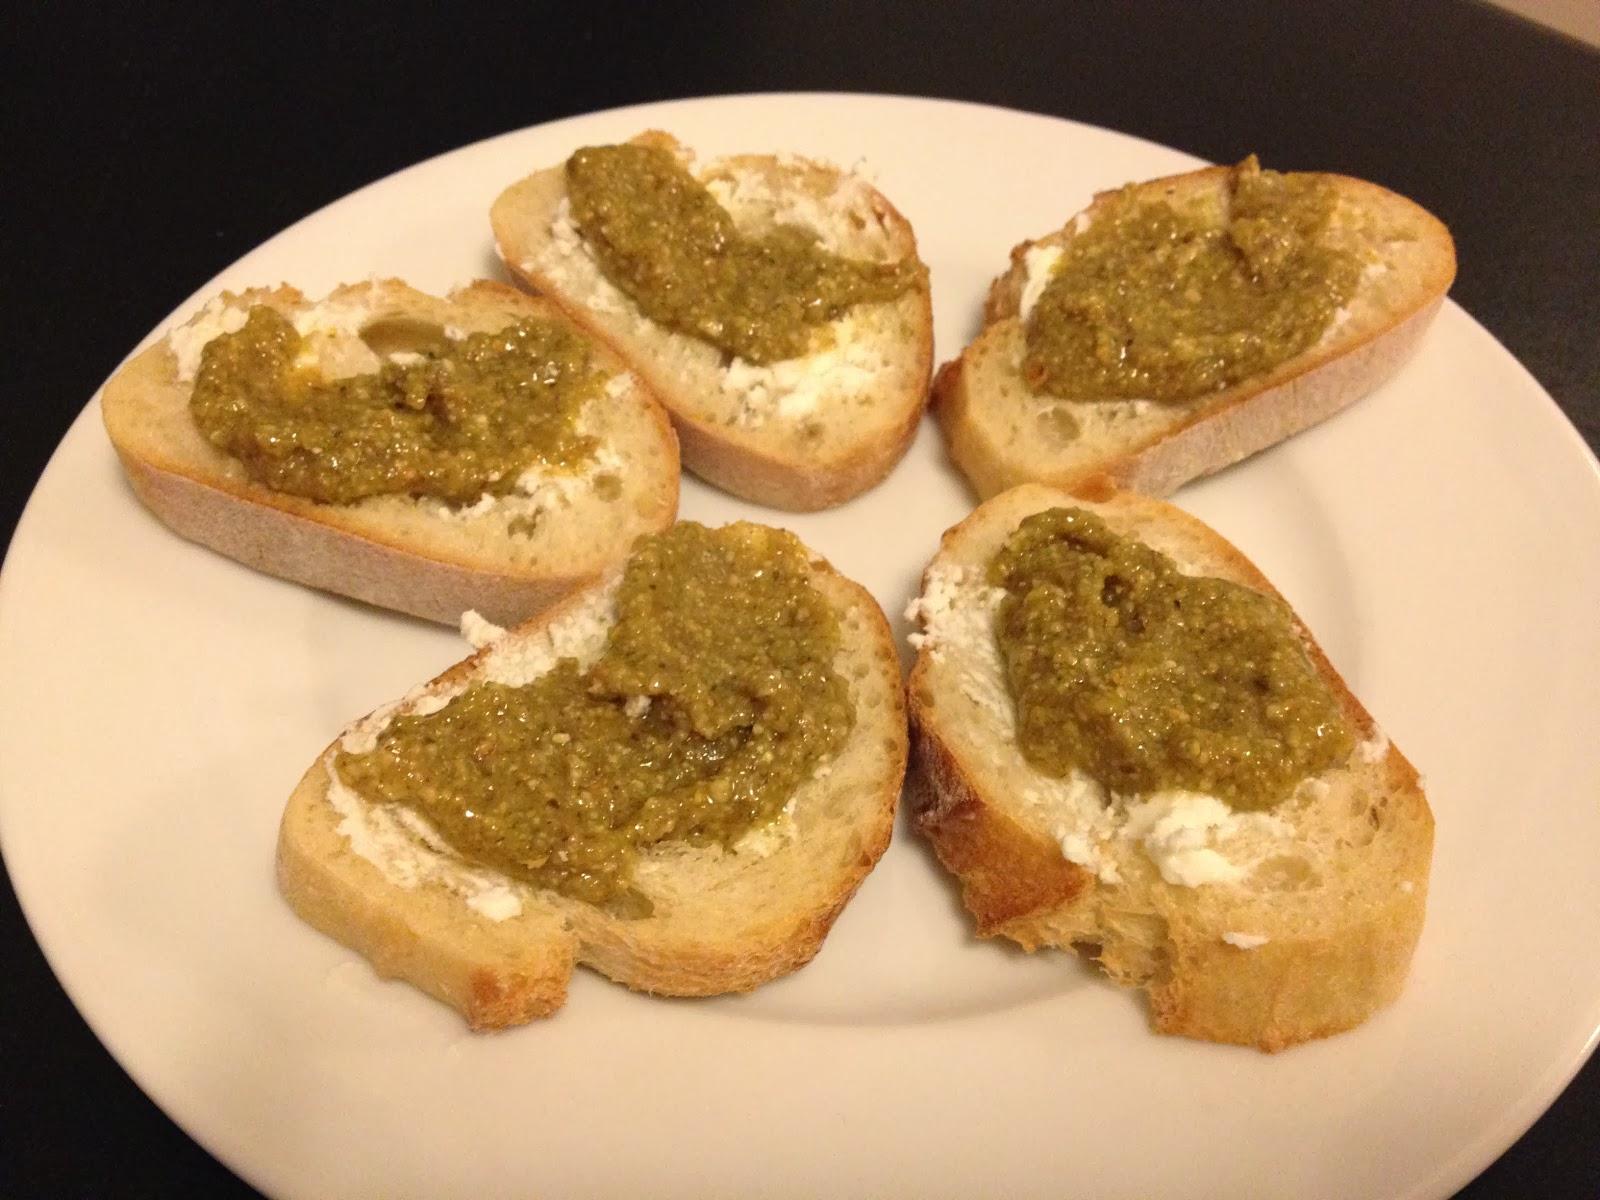 Ruminations on Food: Pumpkin Seed Pesto & Goat Cheese Crostini